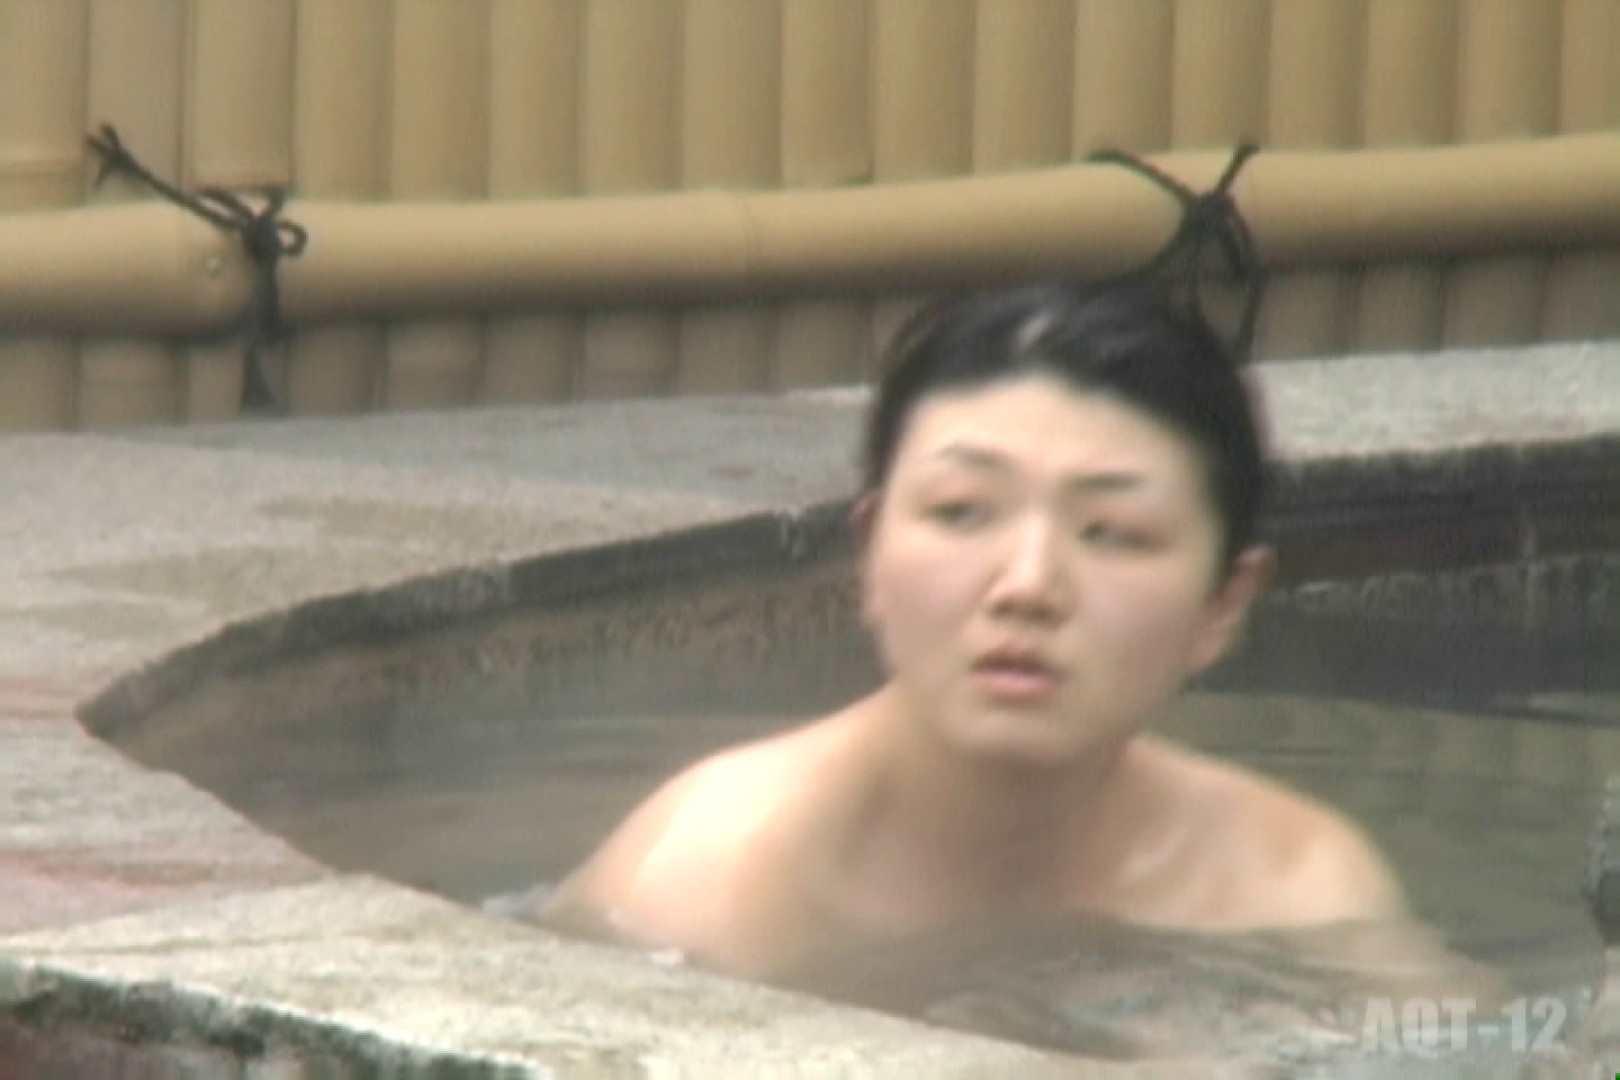 Aquaな露天風呂Vol.810 露天風呂編  108PIX 56